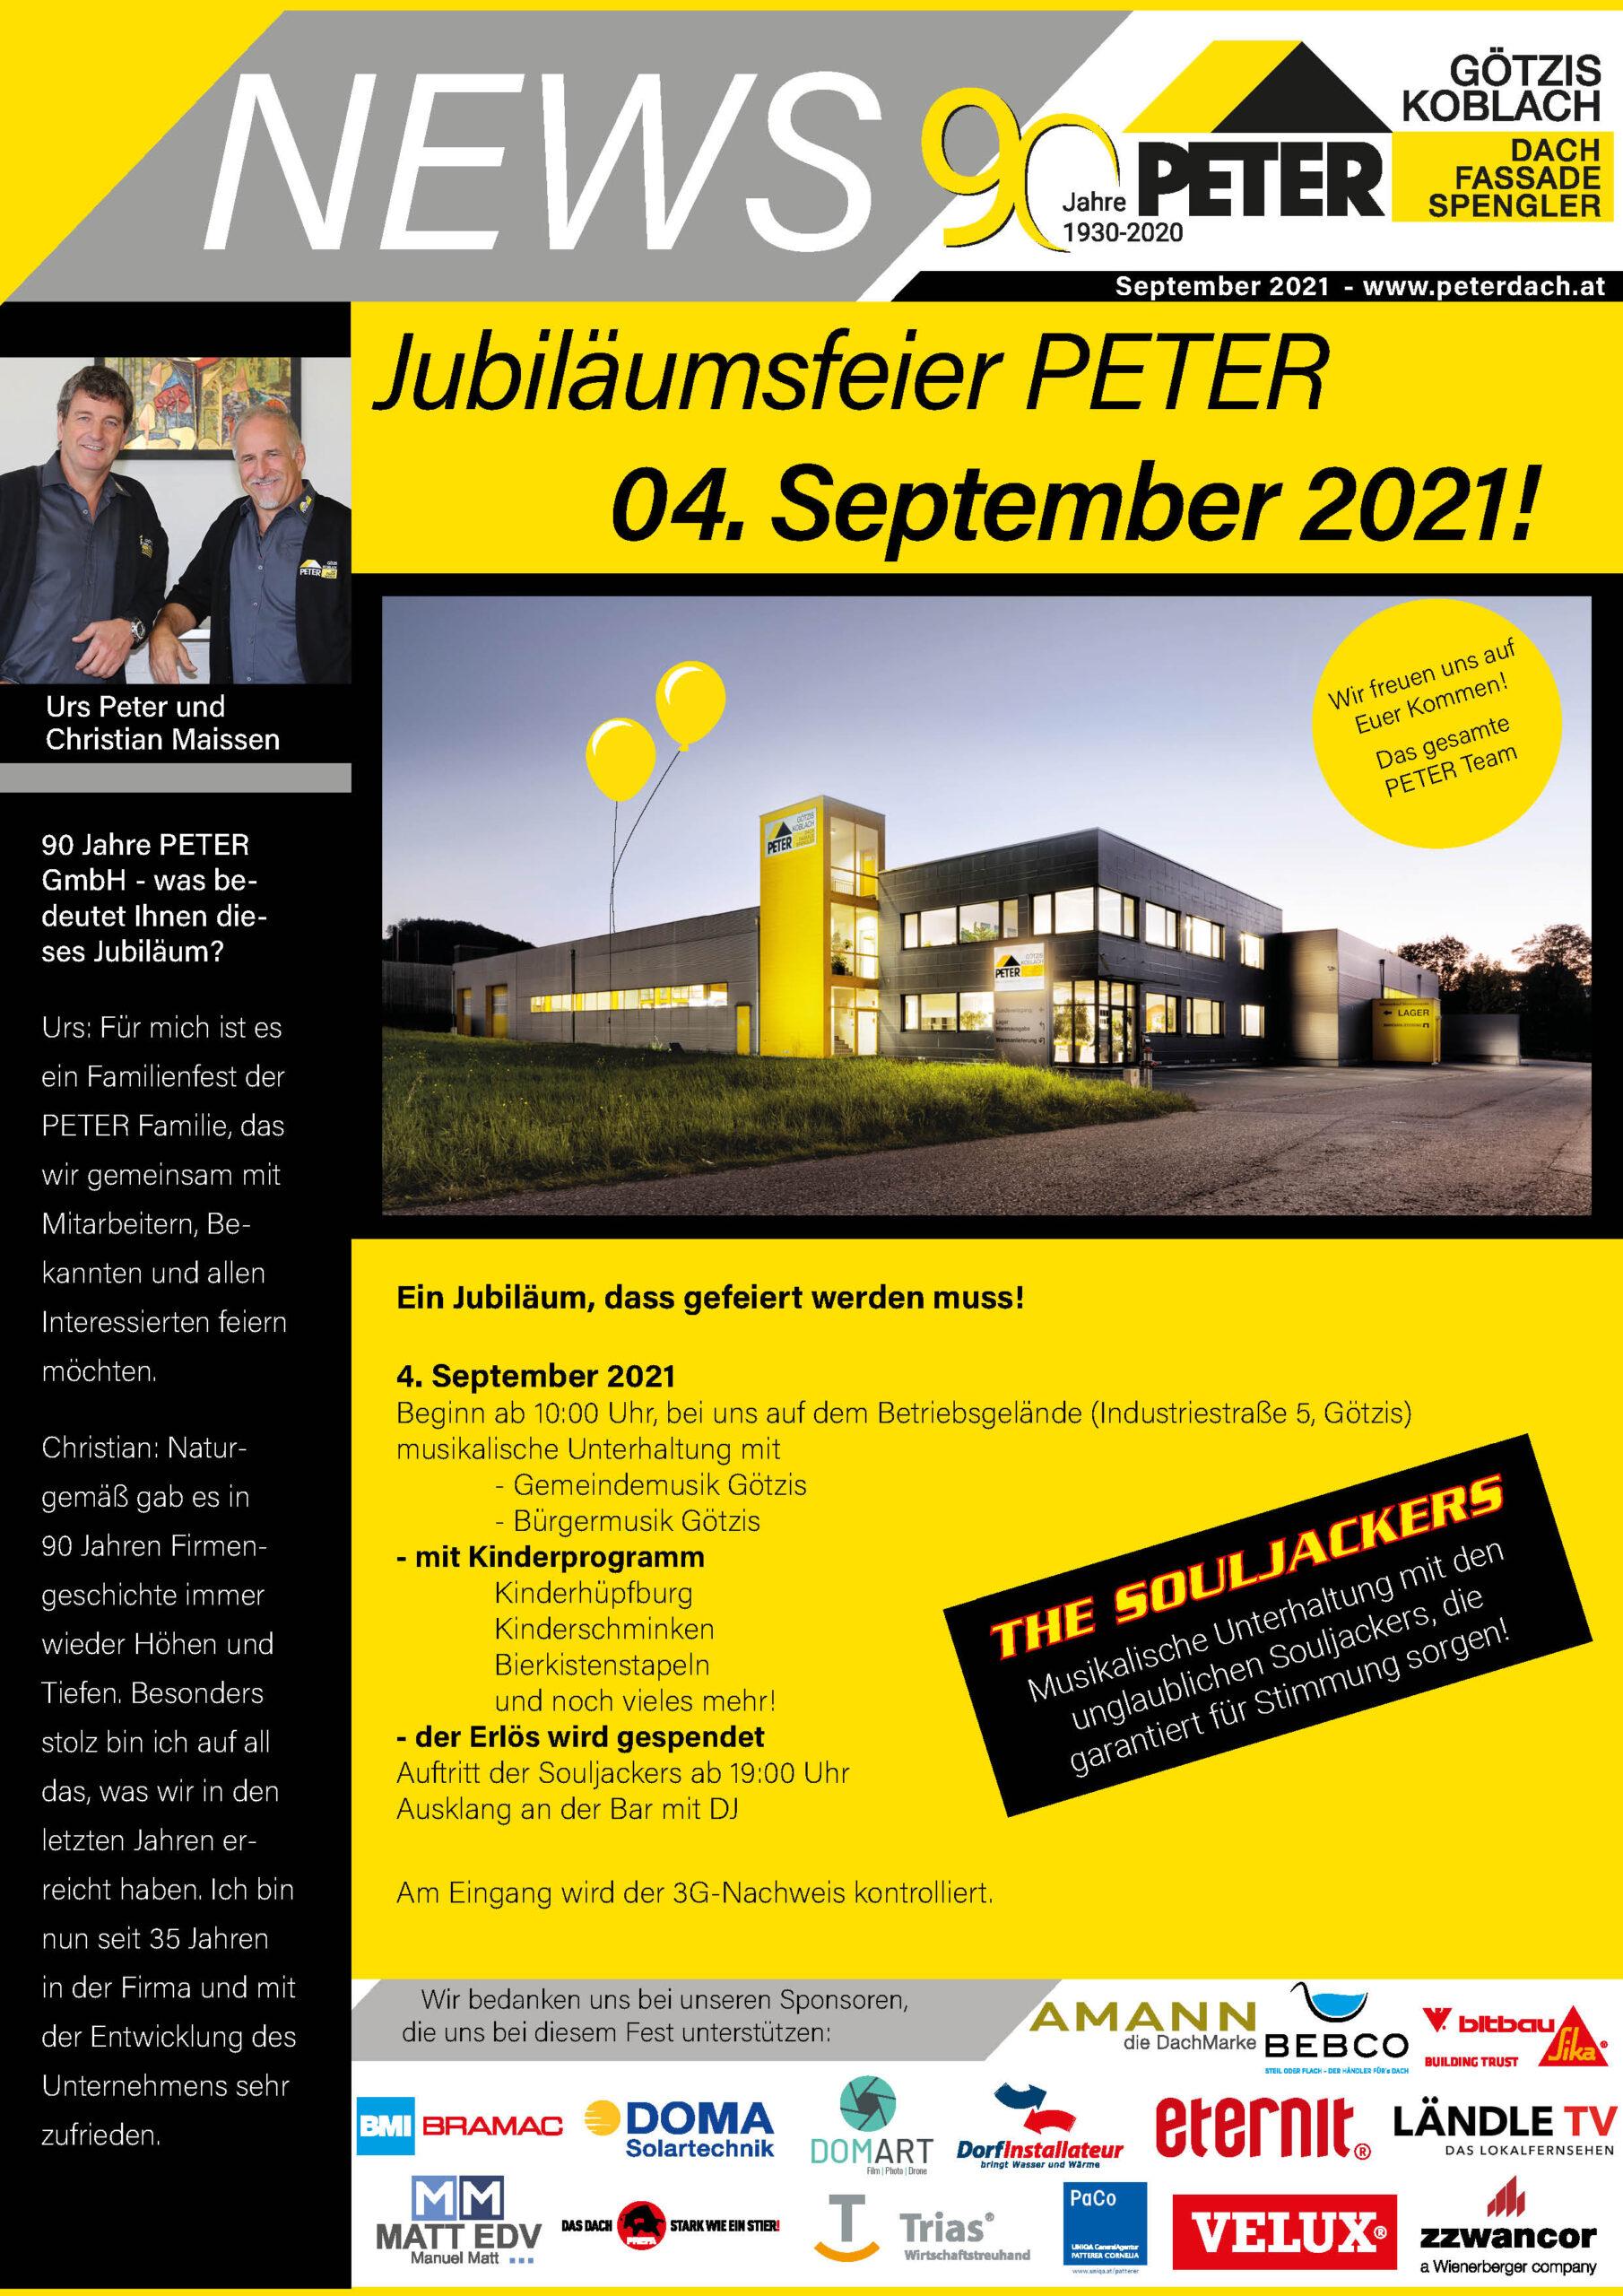 Peter News_Vorarlberg_Dachdecker_Spengler_September-2021